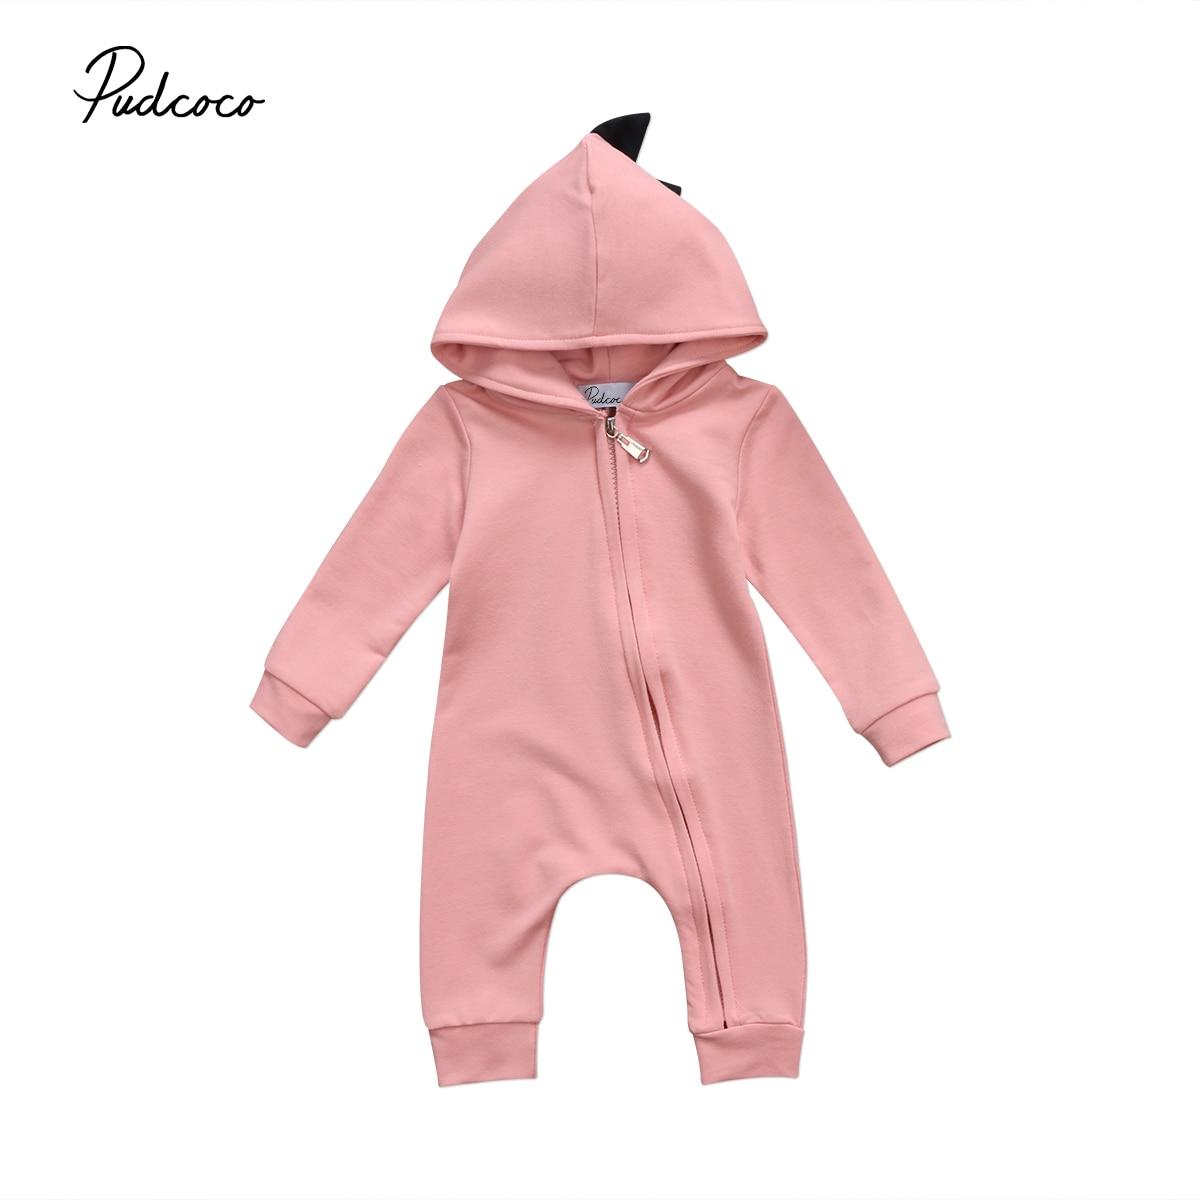 Helen115 Newborn baby girl clothes baby boy clothes Dinosaur Full Sleeve Zipper Bodysuit 0-24M dk readers l3 helen keller